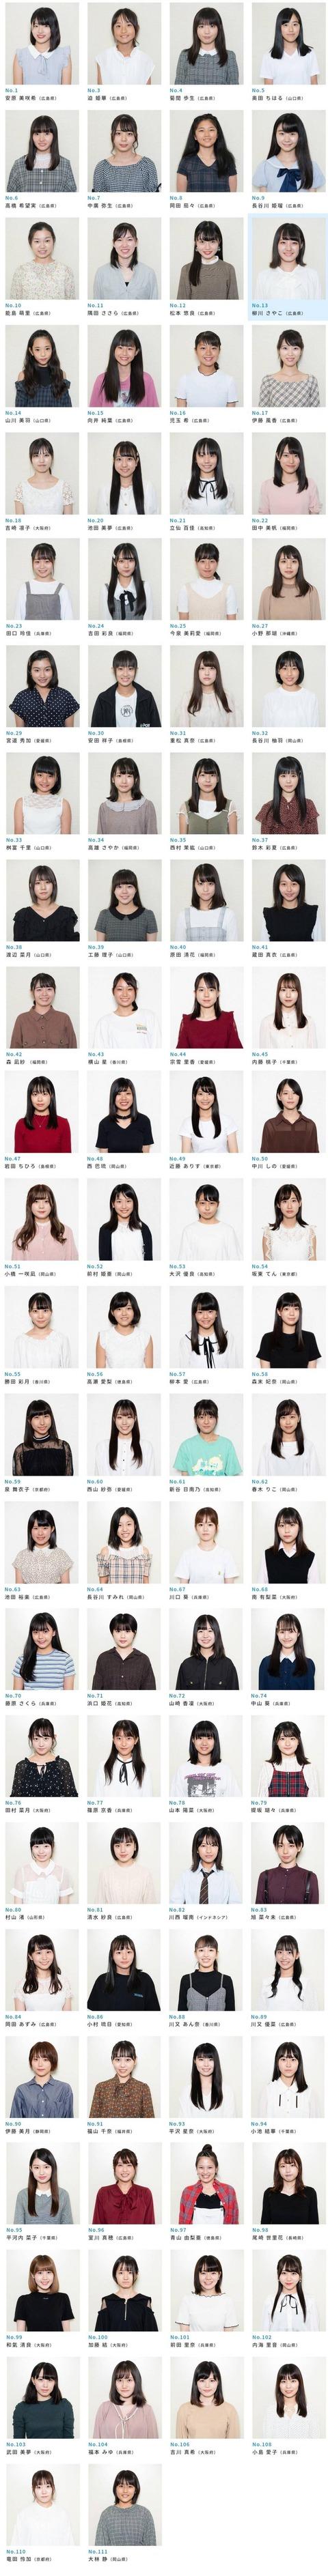 【STU48】2期生候補、瀧野由美子クラスがゴロゴロいるwww